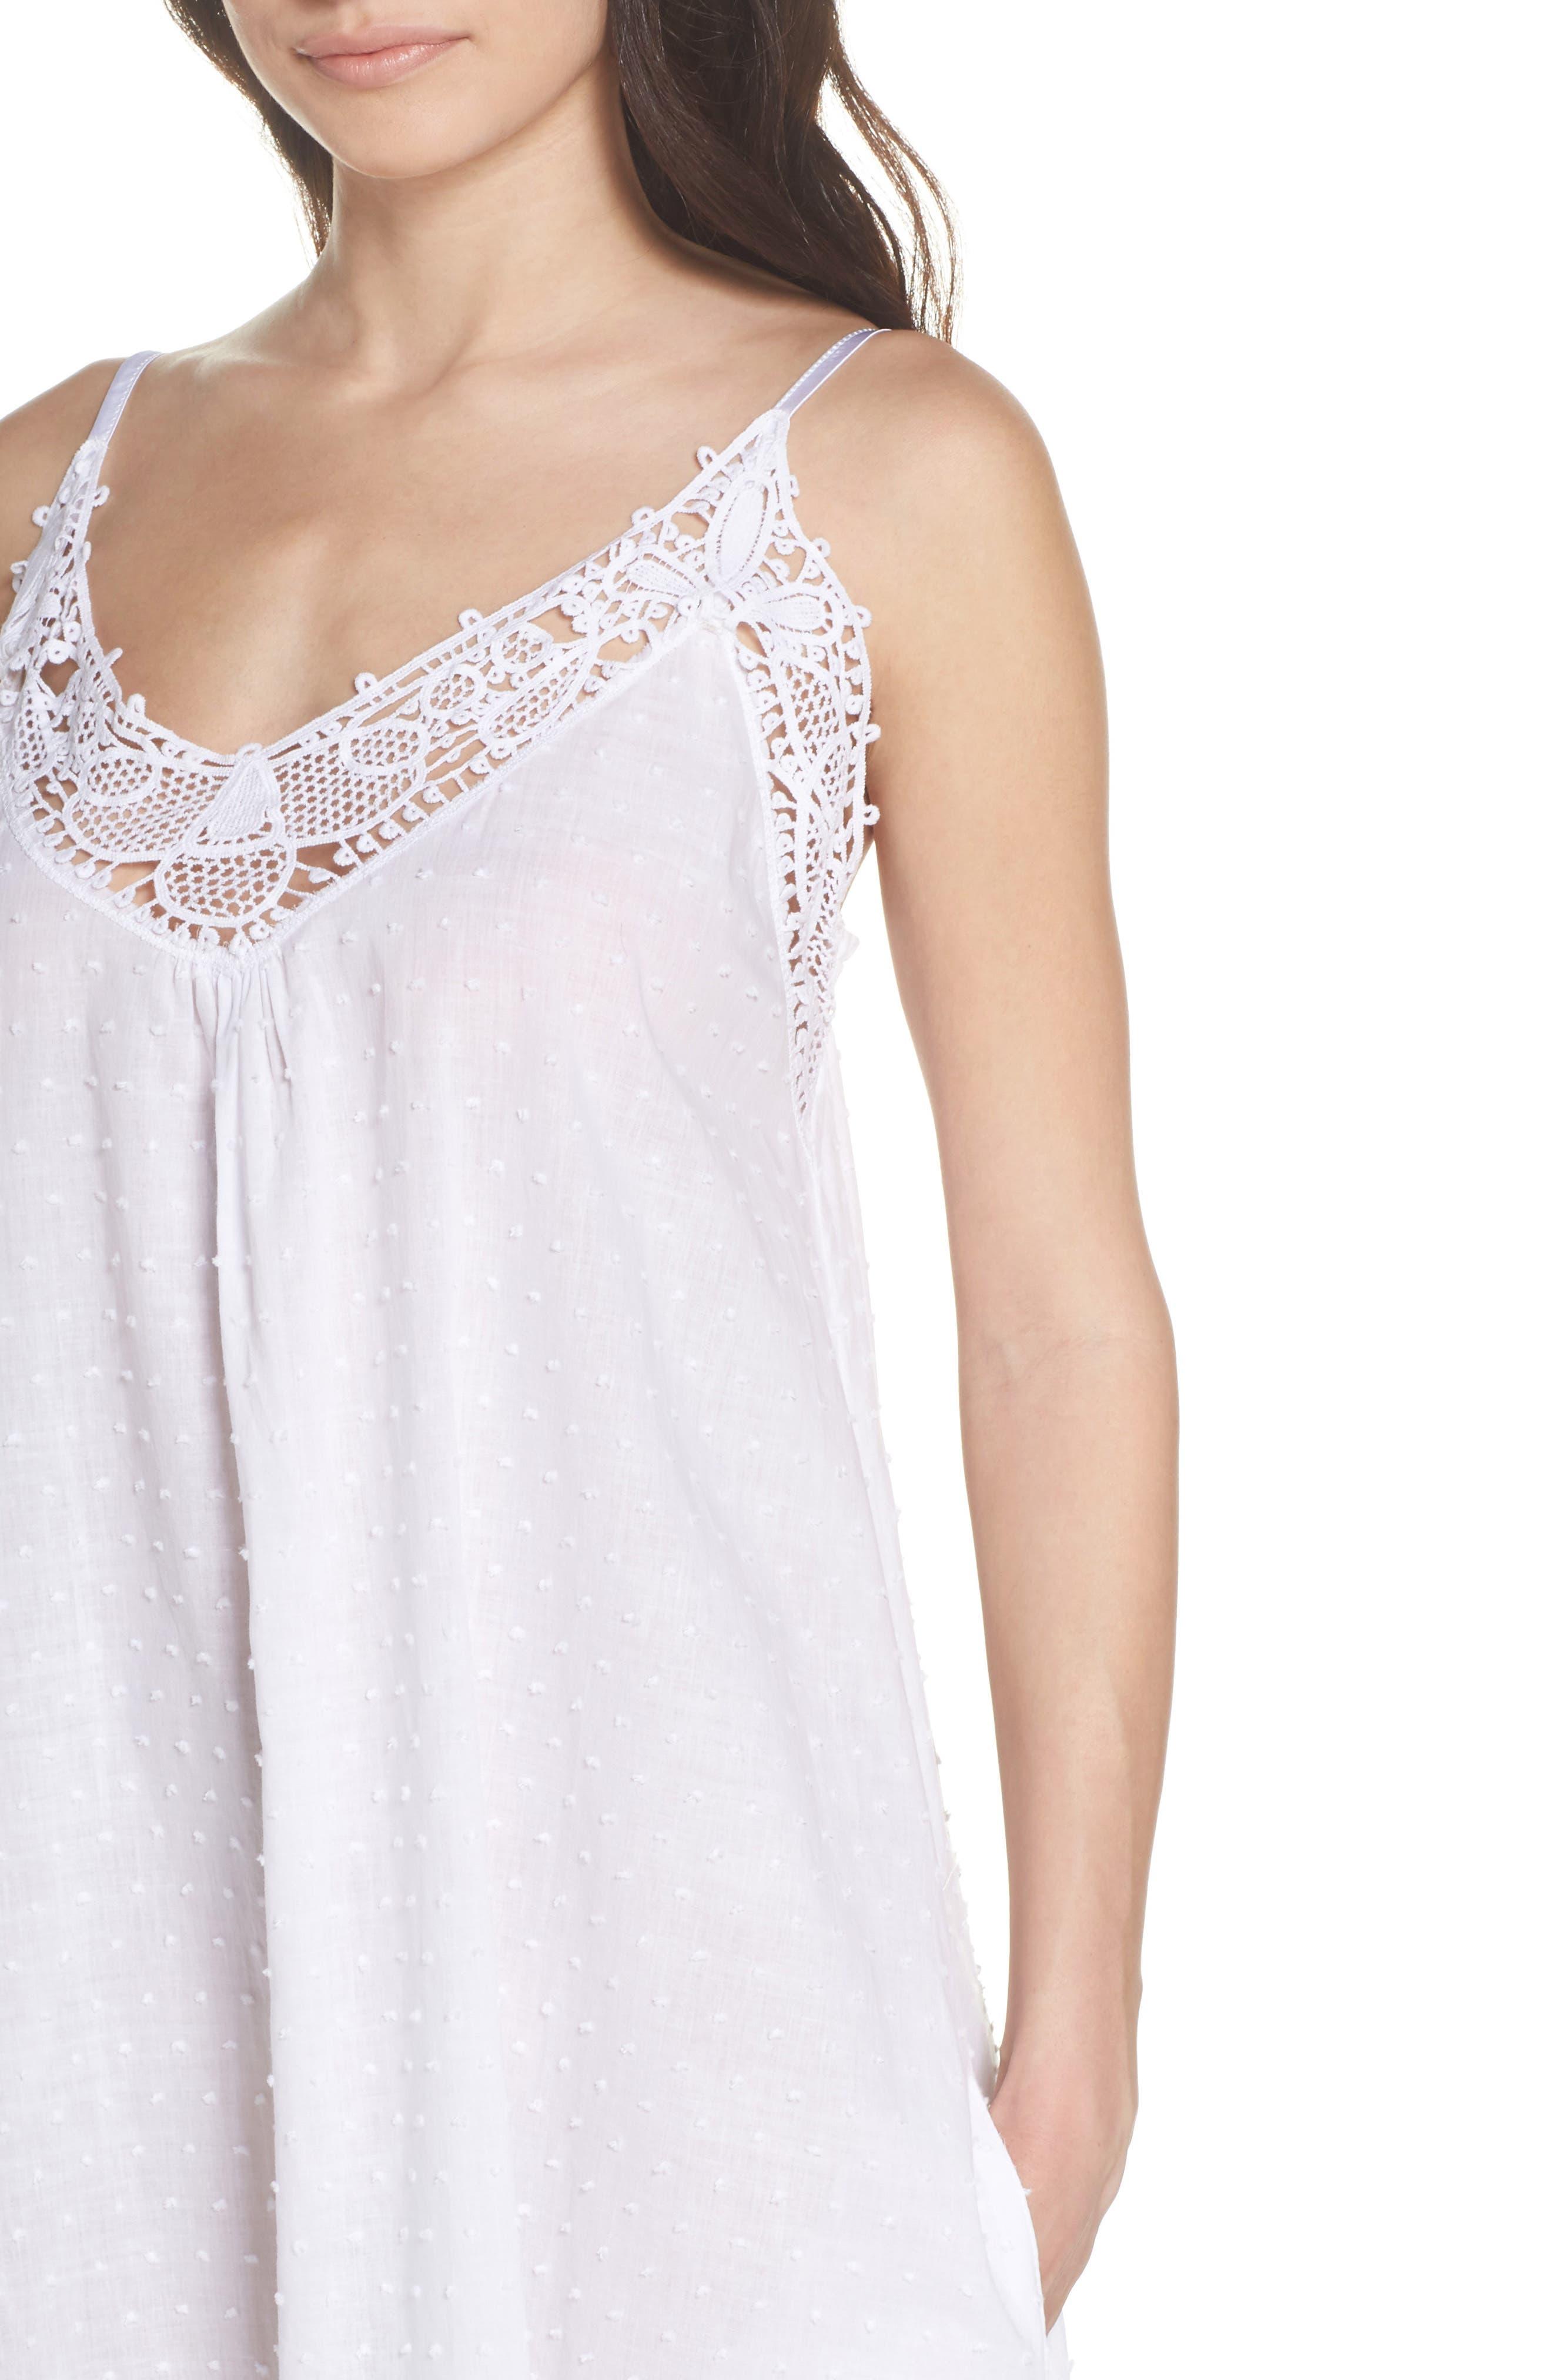 Swiss Dot Nightgown,                             Alternate thumbnail 4, color,                             White